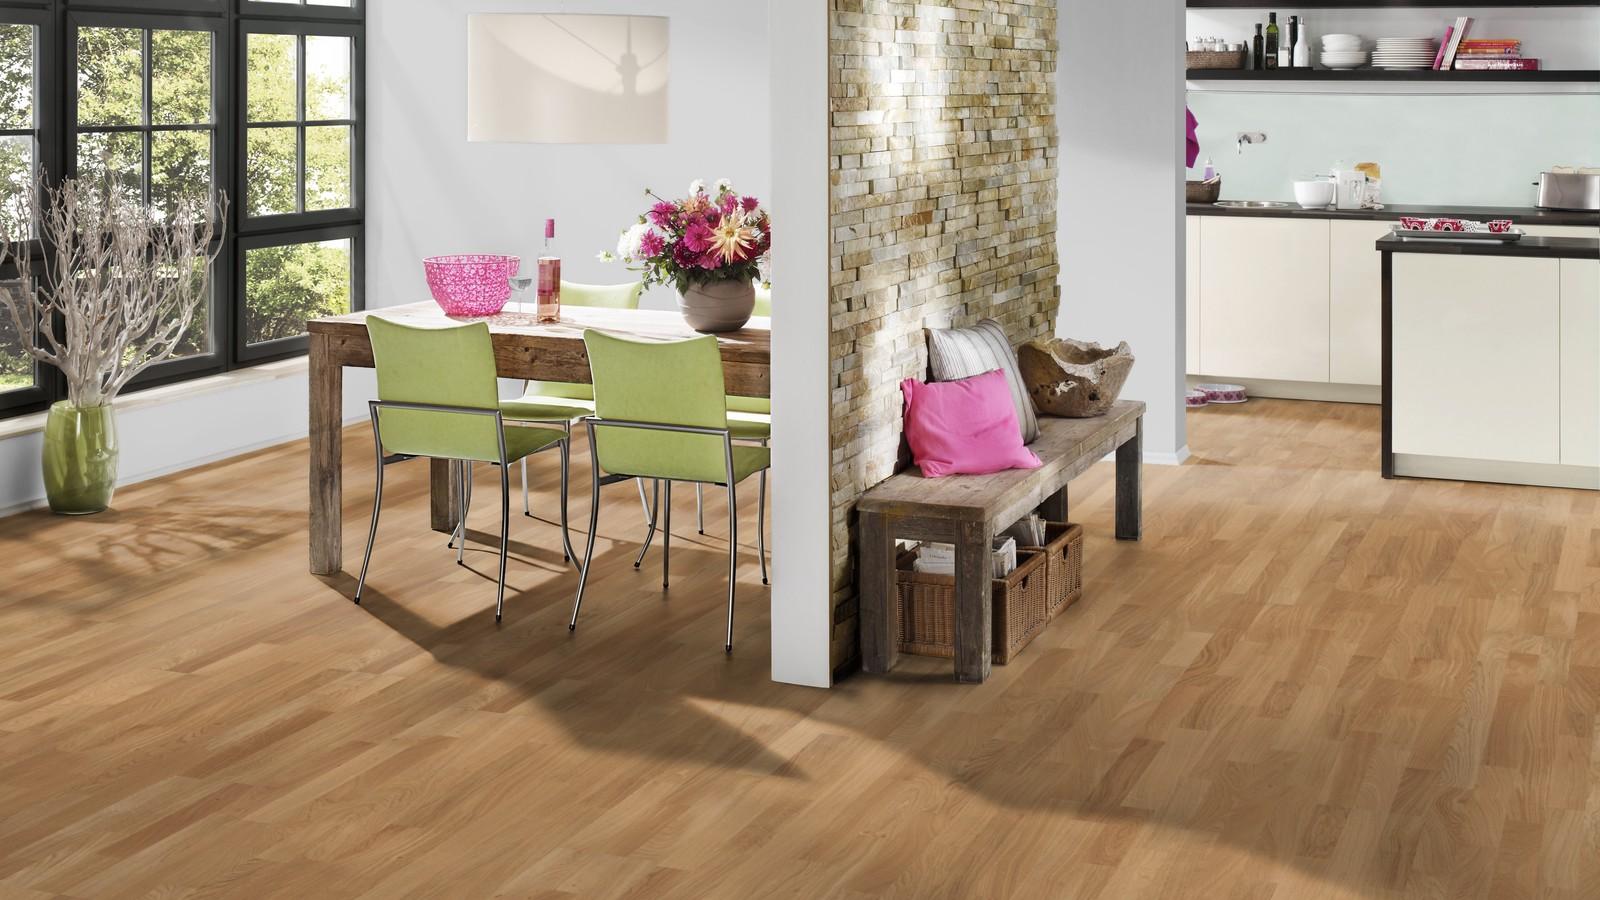 ter h rne bright collection l parkett l b27 eiche l schiffsboden preisbrecher. Black Bedroom Furniture Sets. Home Design Ideas